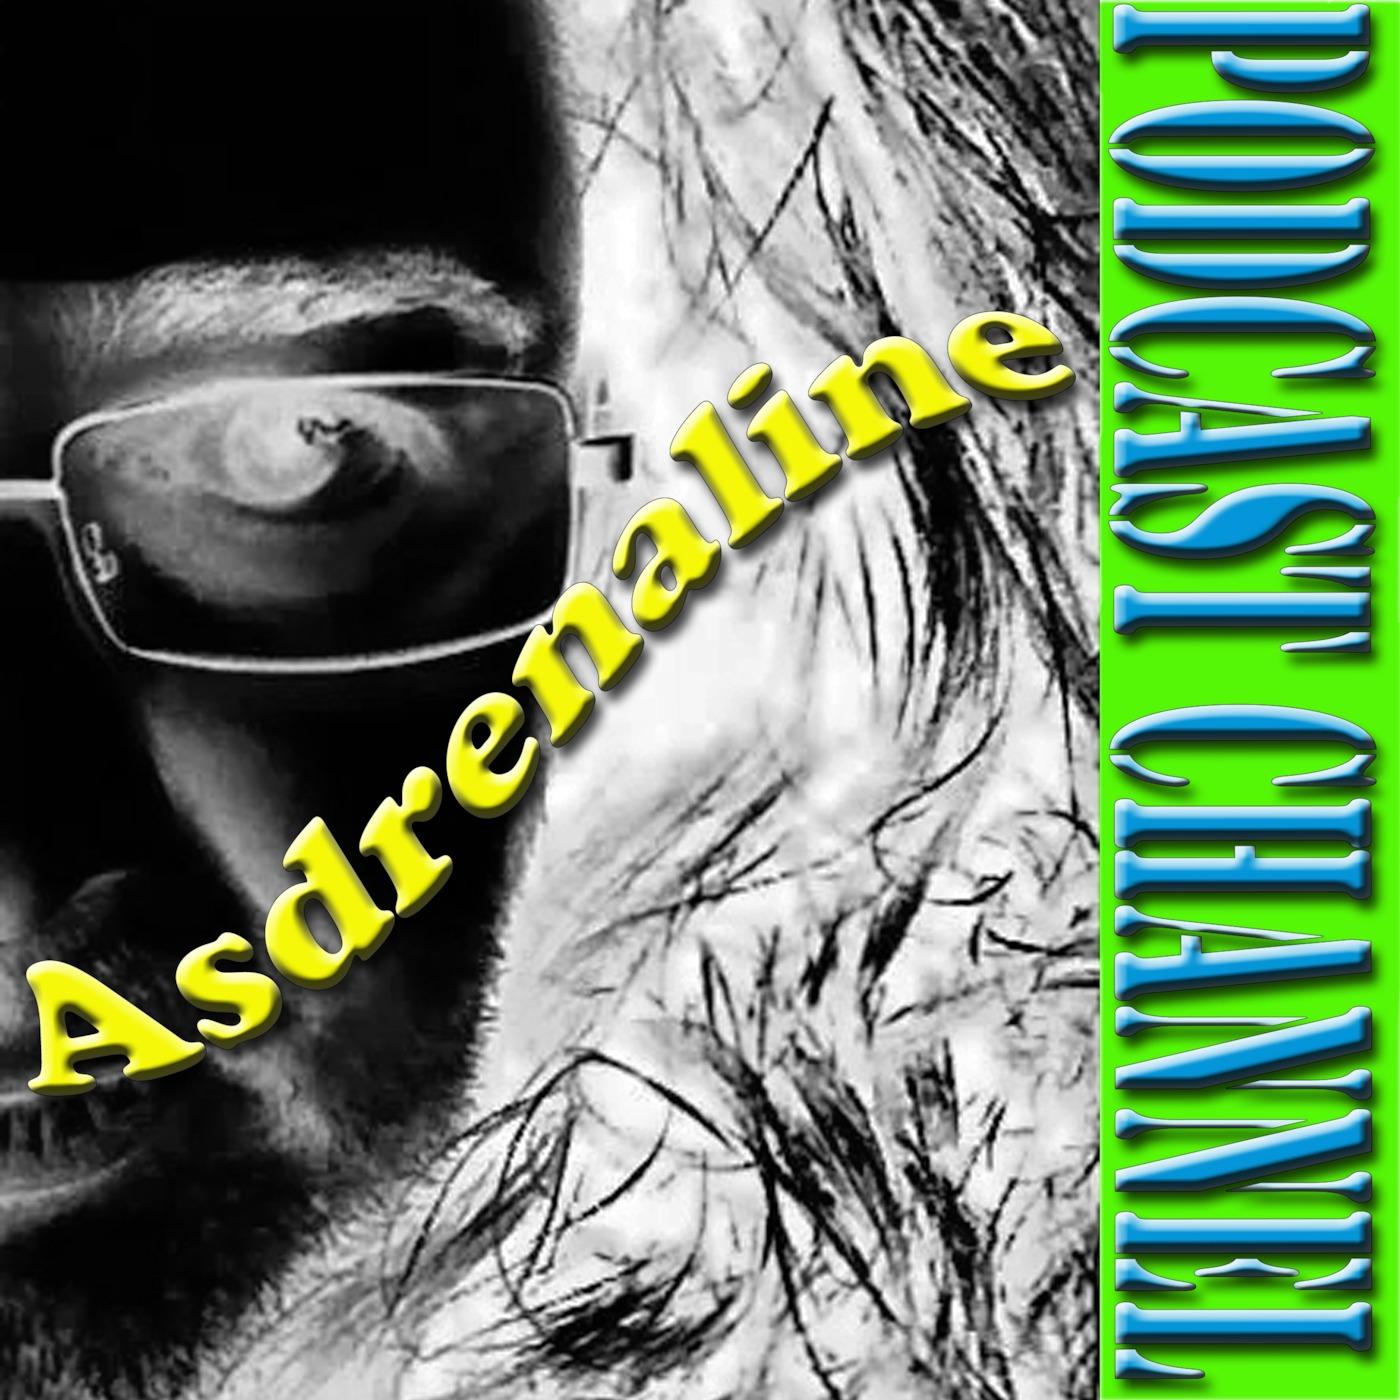 Prelude to Asdrenaline Podcast Channel